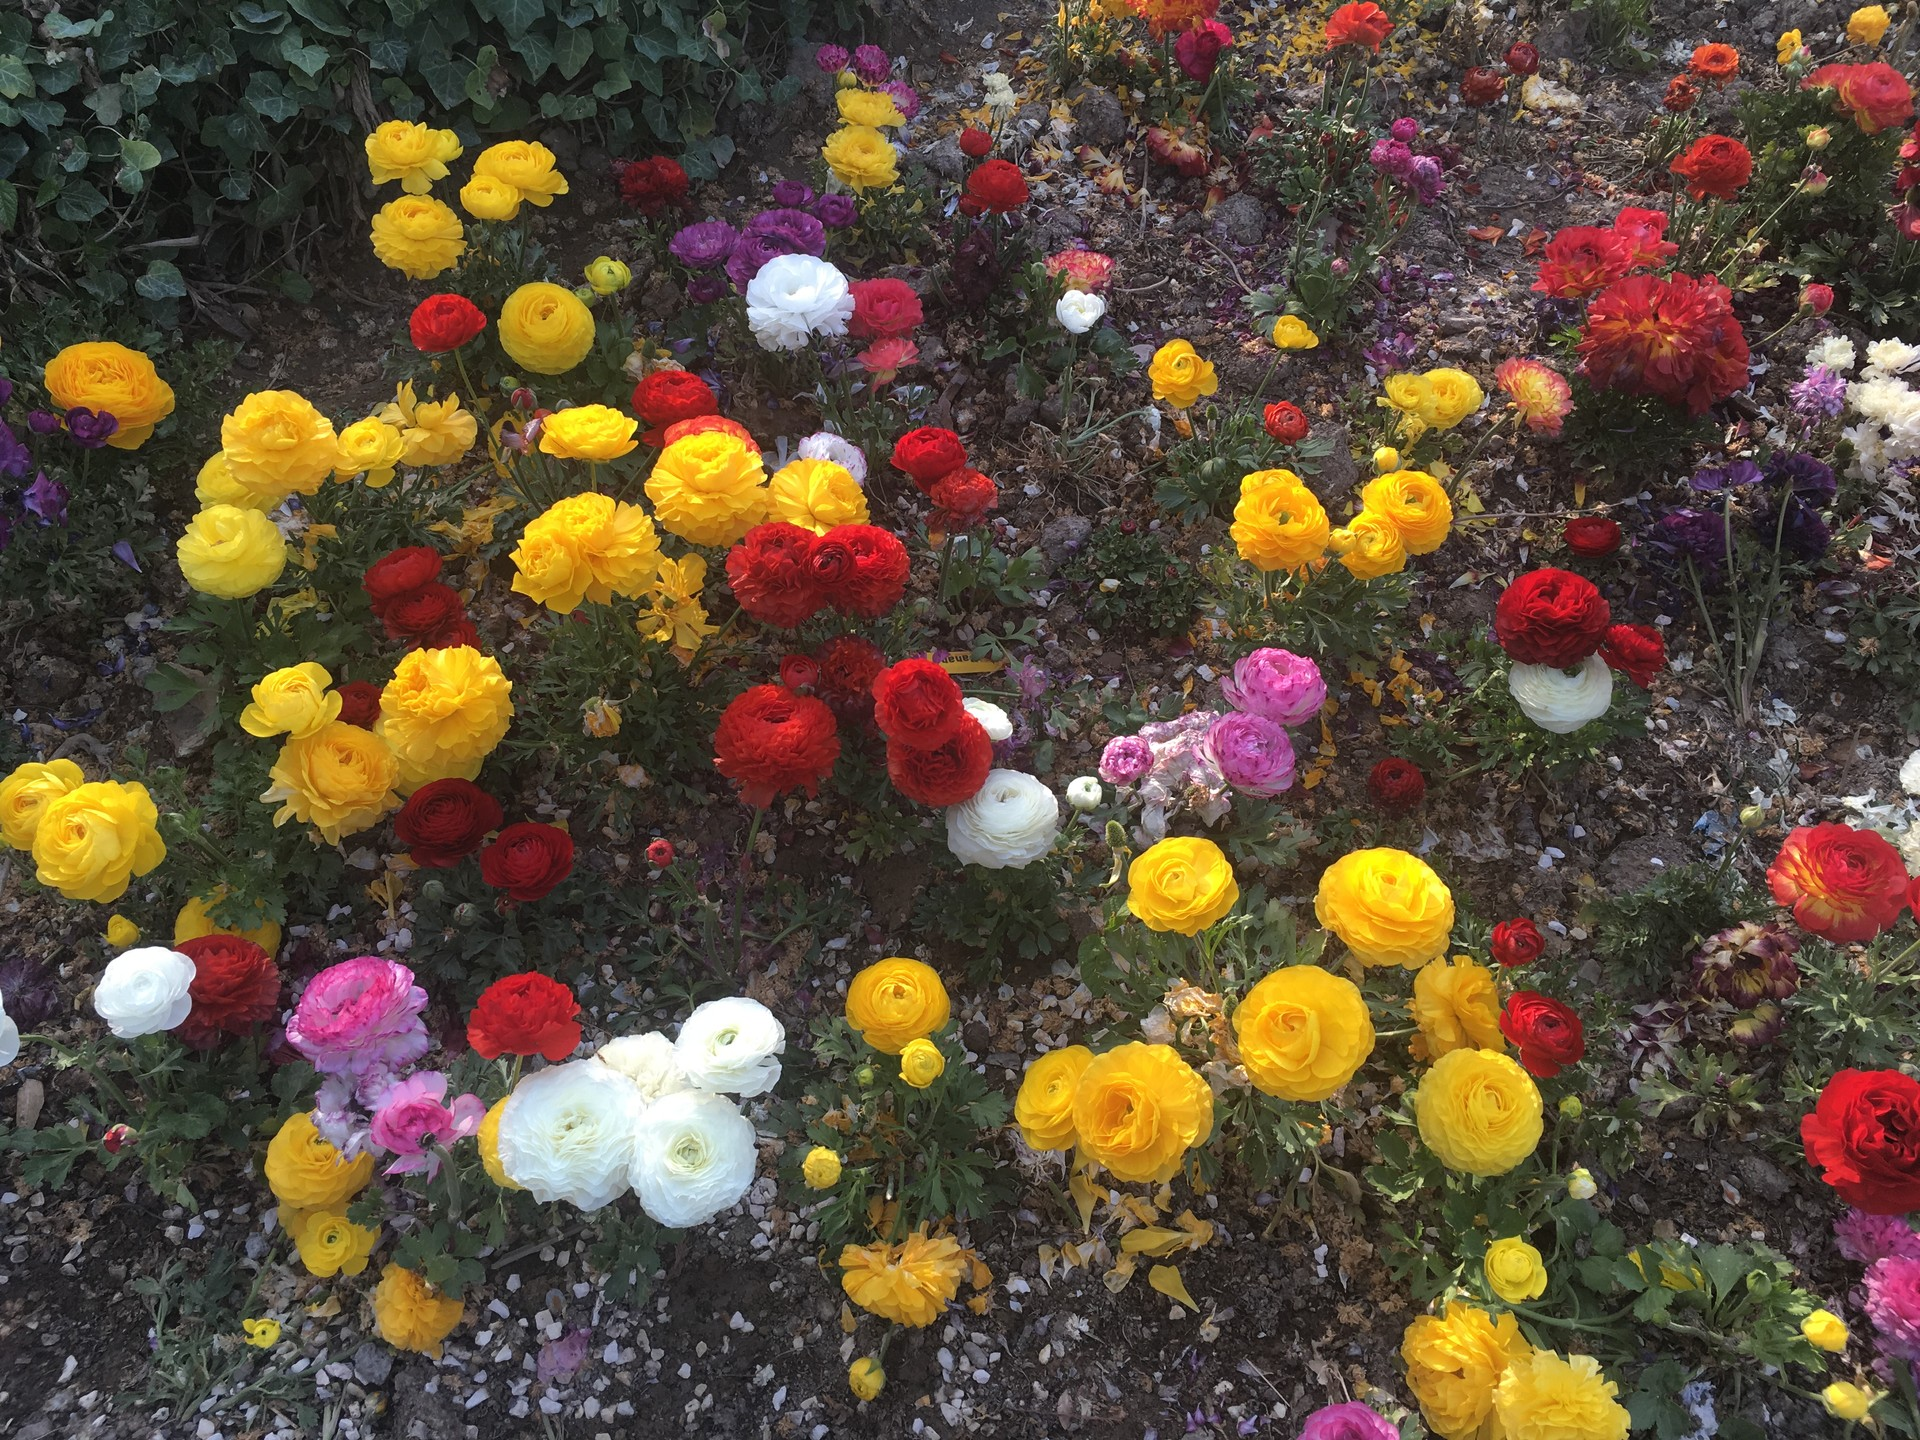 flower-garden-isfahan-2f3ded726070c9f330